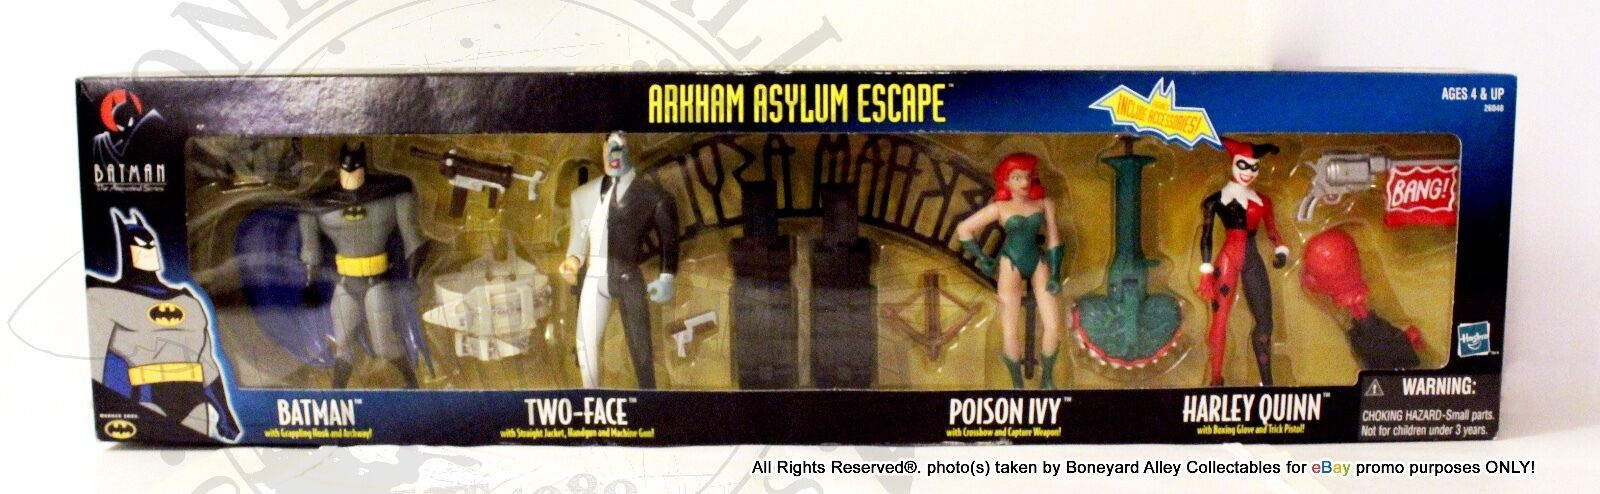 BATMAN TRU Exclusive ARKHAM ASYLUM ESCAPE MISBNEWRARE-HASBRO